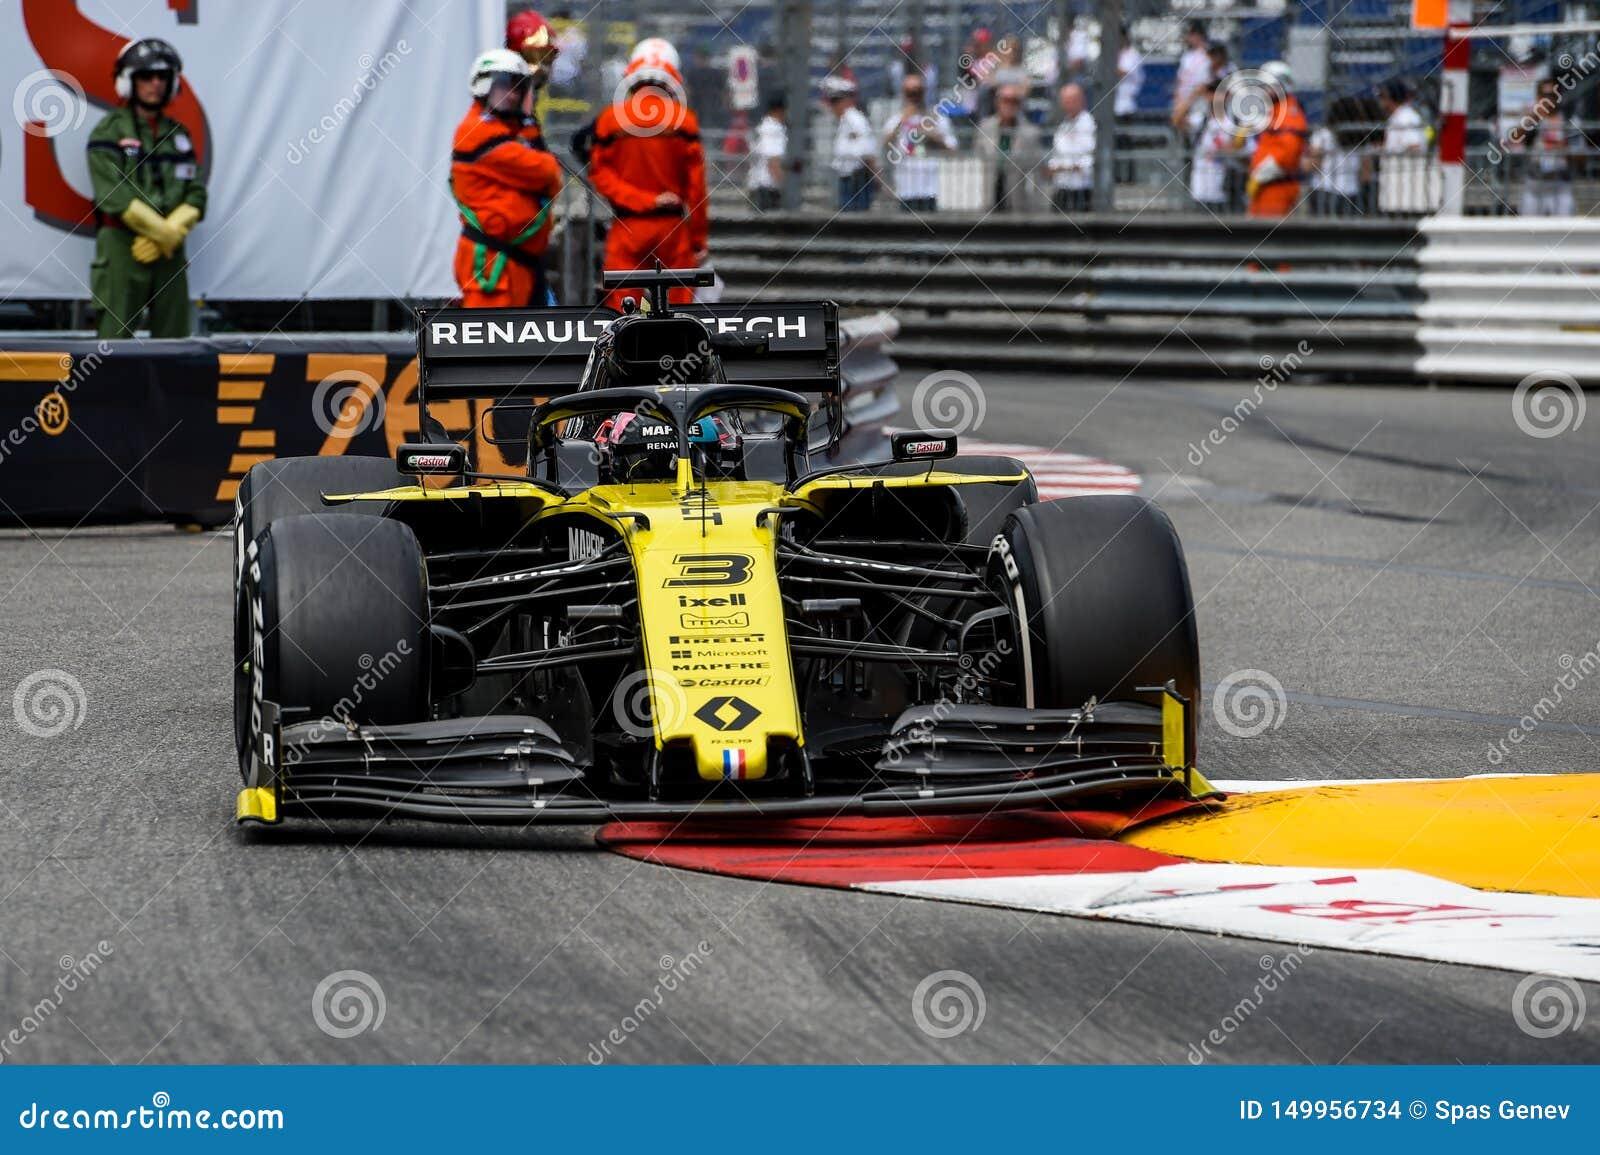 3 Daniel Ricciardo Aus Equipe De Renault F1 R S 19 Imagem De Stock Editorial Imagem De Renault Daniel 149956734